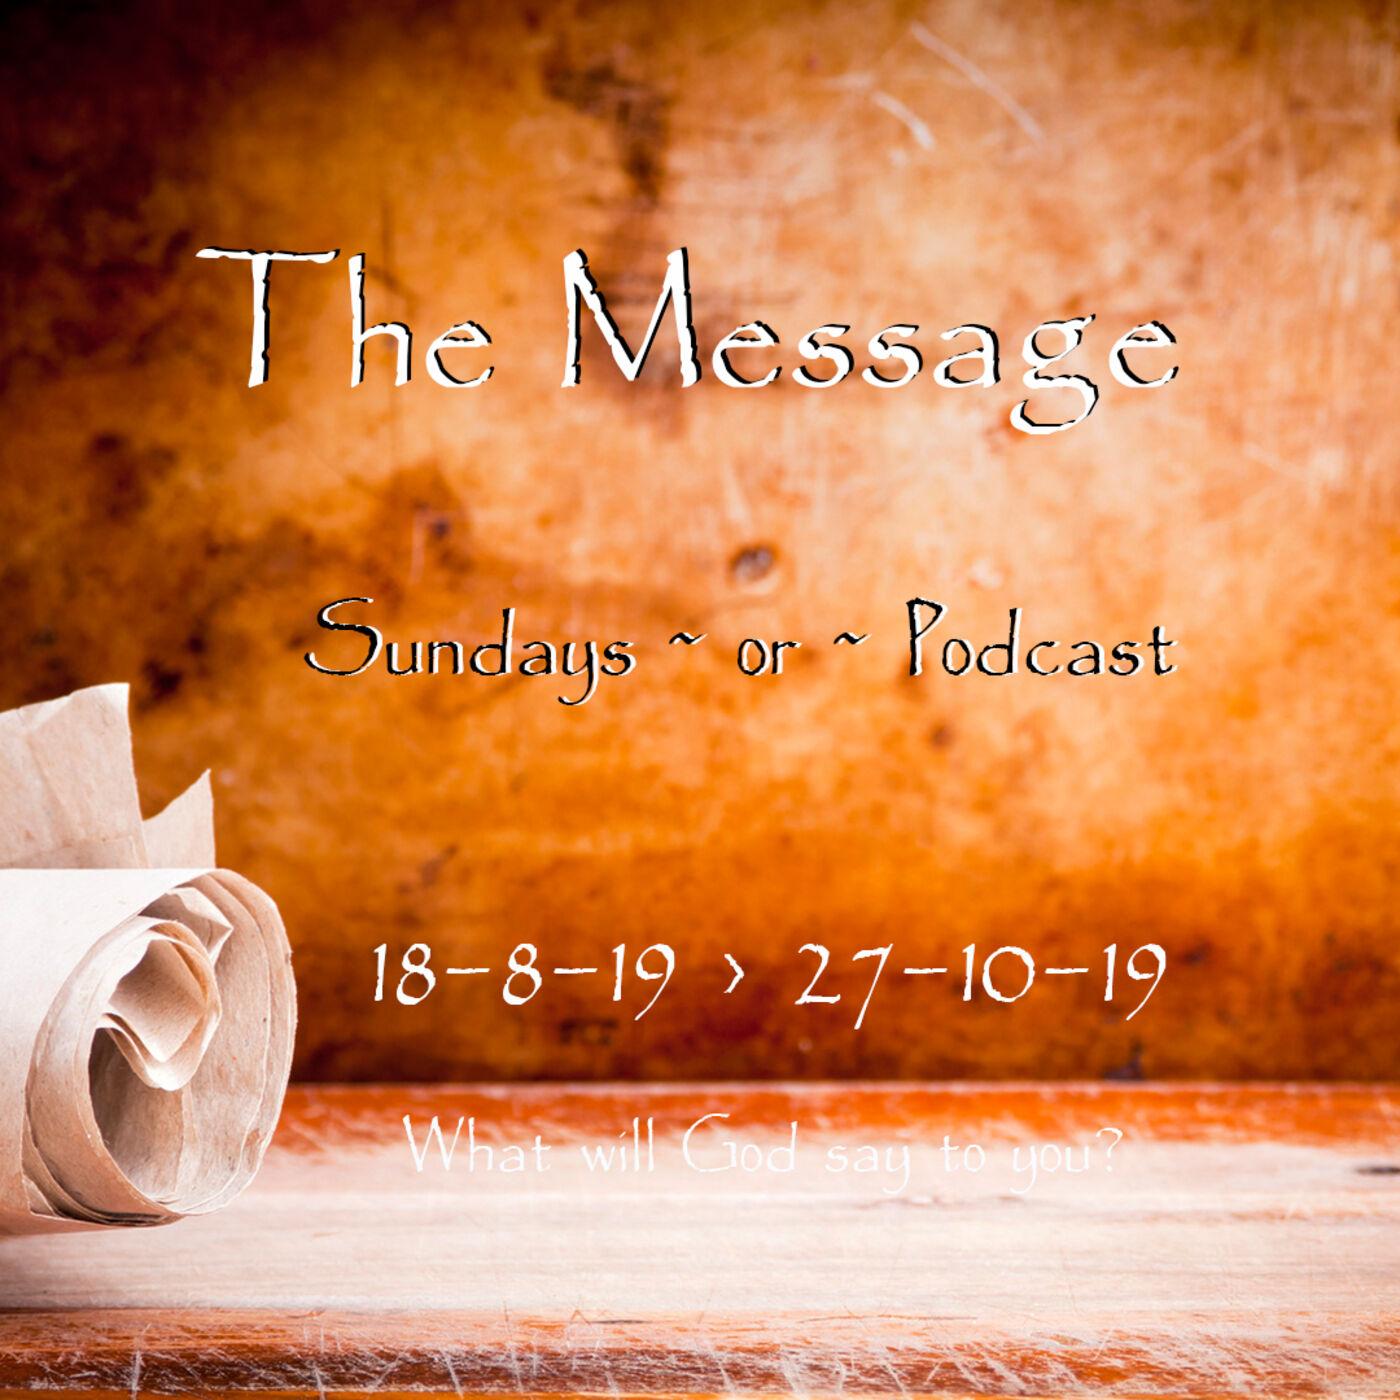 20190908 The Messenger